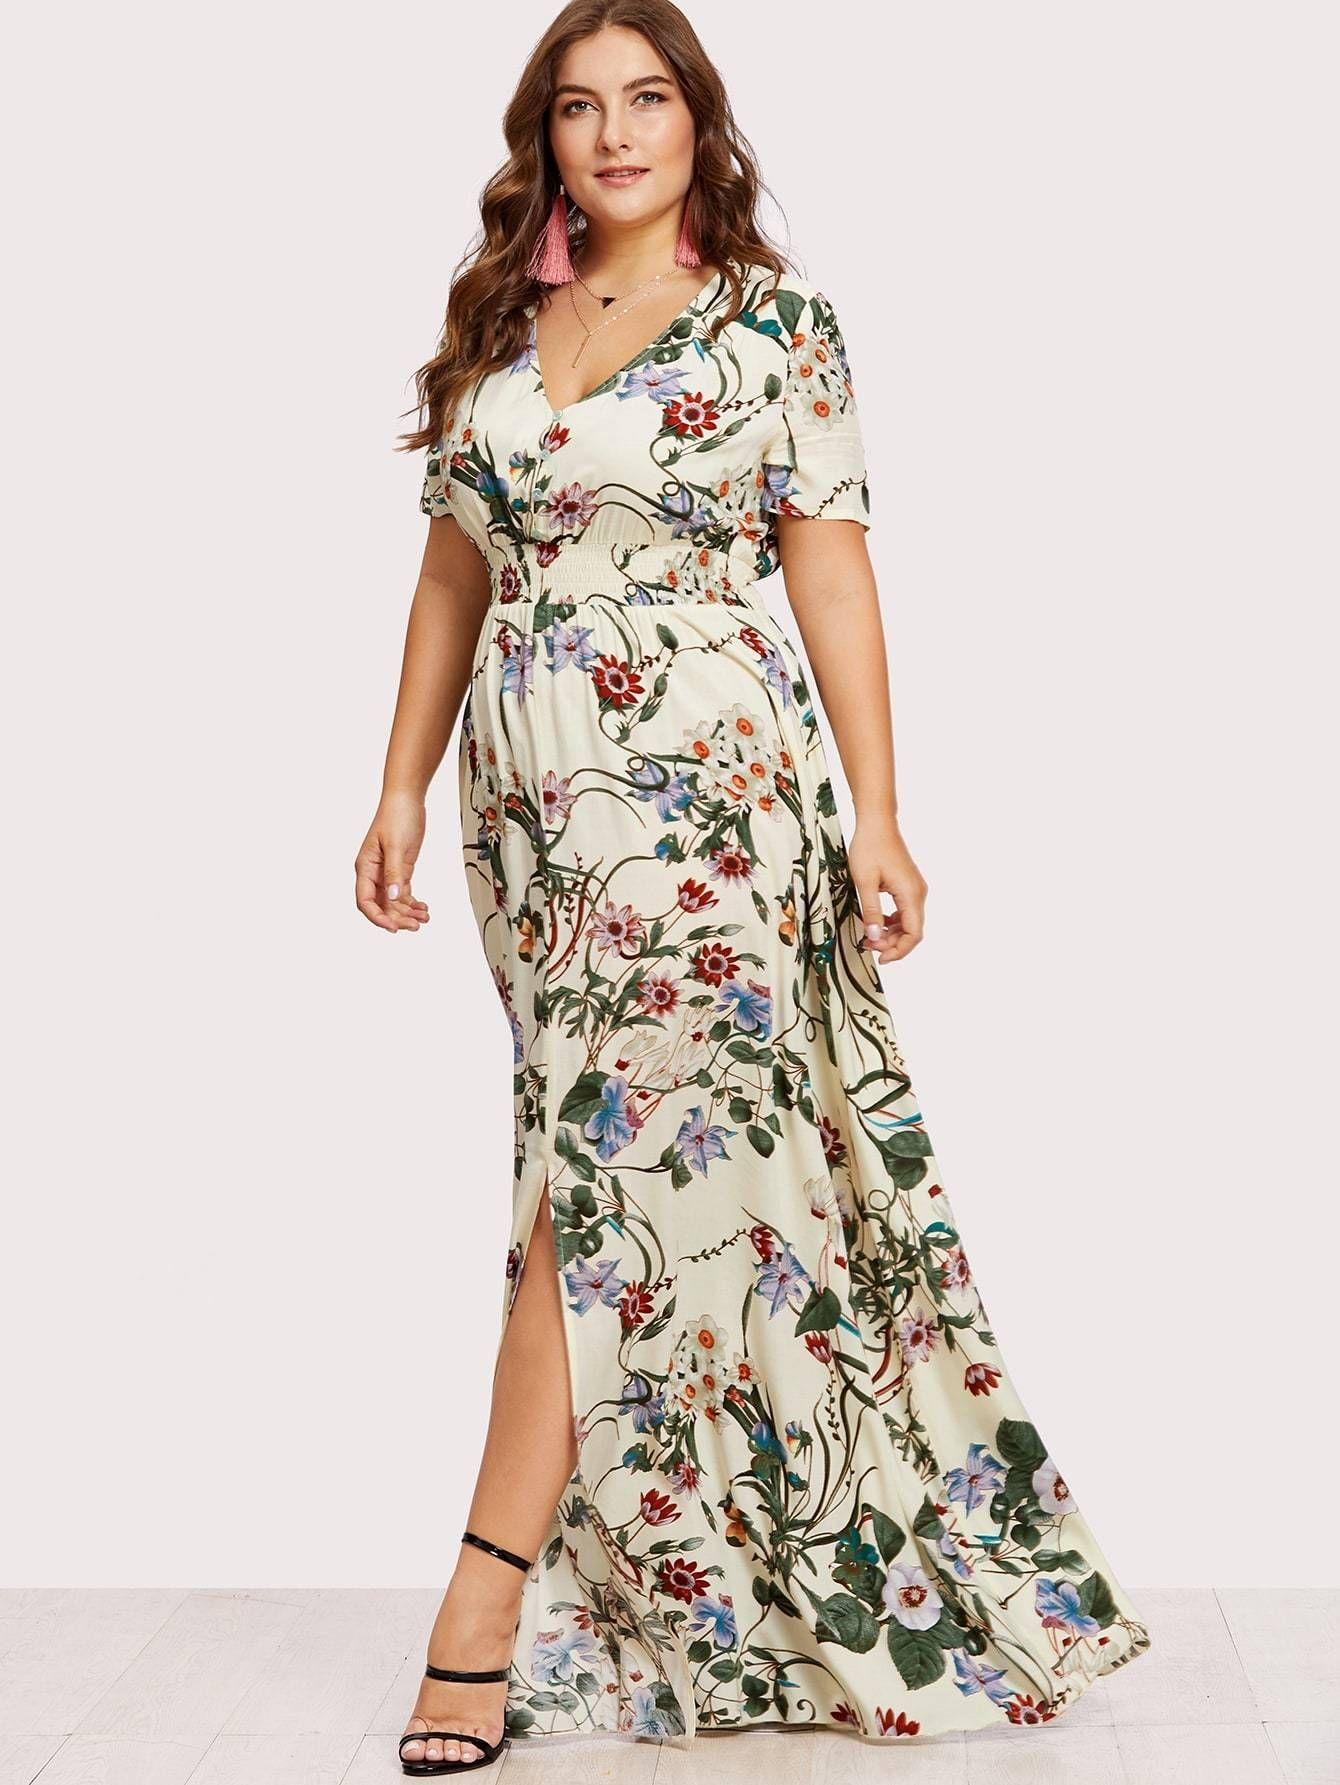 Plus Size Bohemian Clothing Online Australia